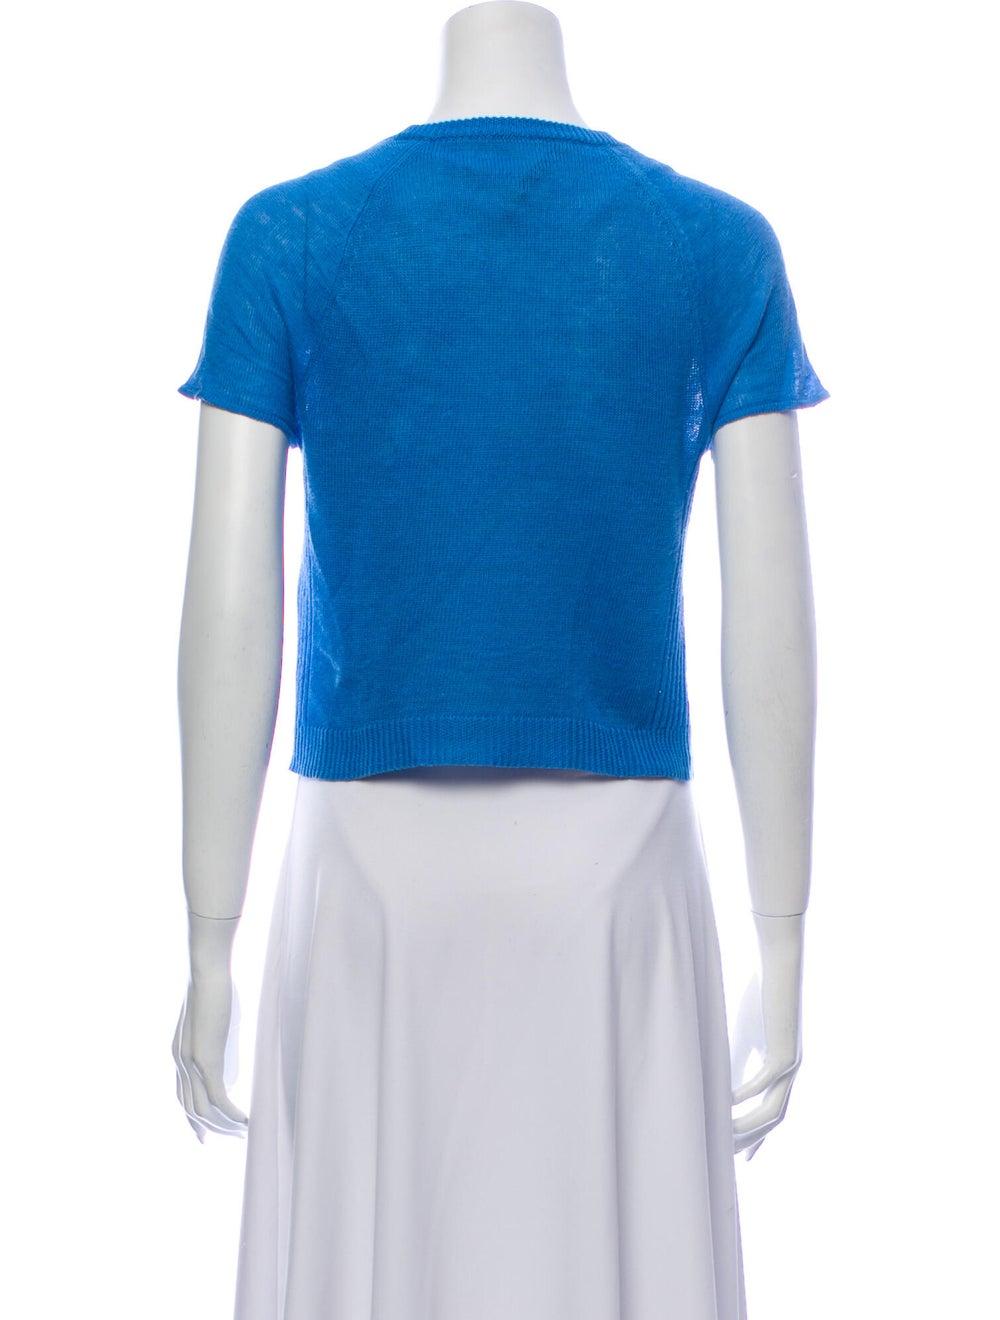 Alice + Olivia Linen Crew Neck T-Shirt Blue - image 3